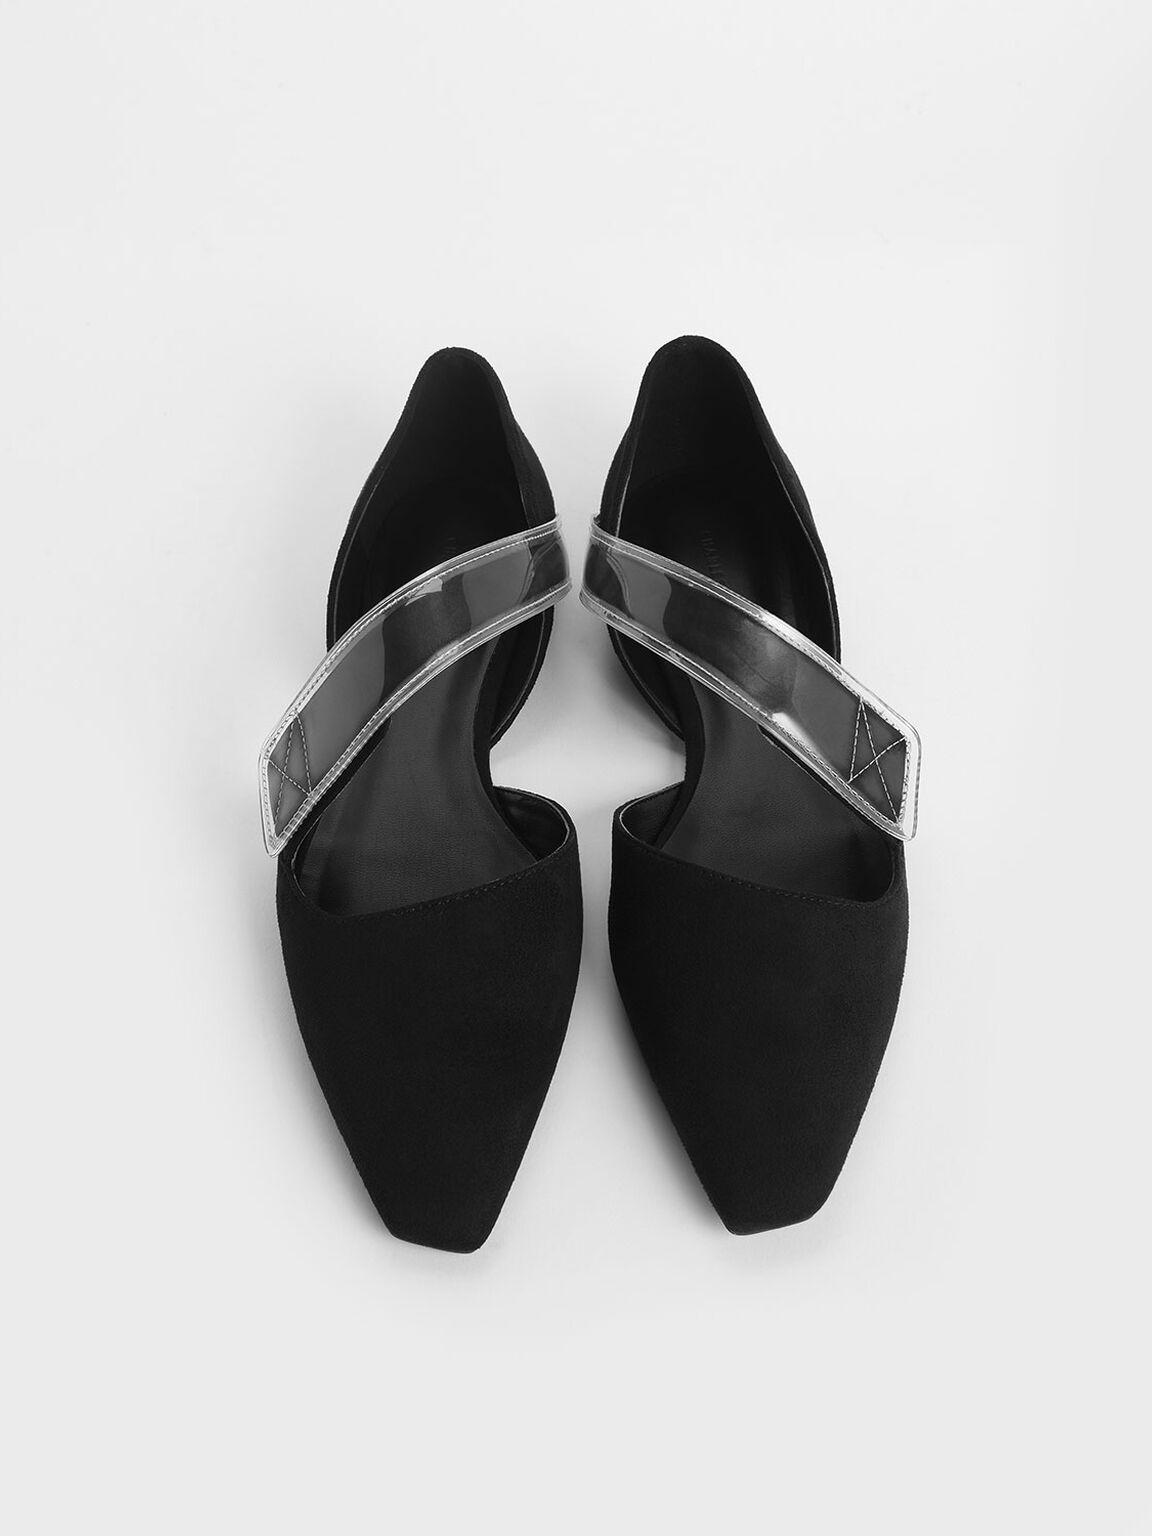 Asymmetric See-Through Strap Mary Jane Flats, Black, hi-res